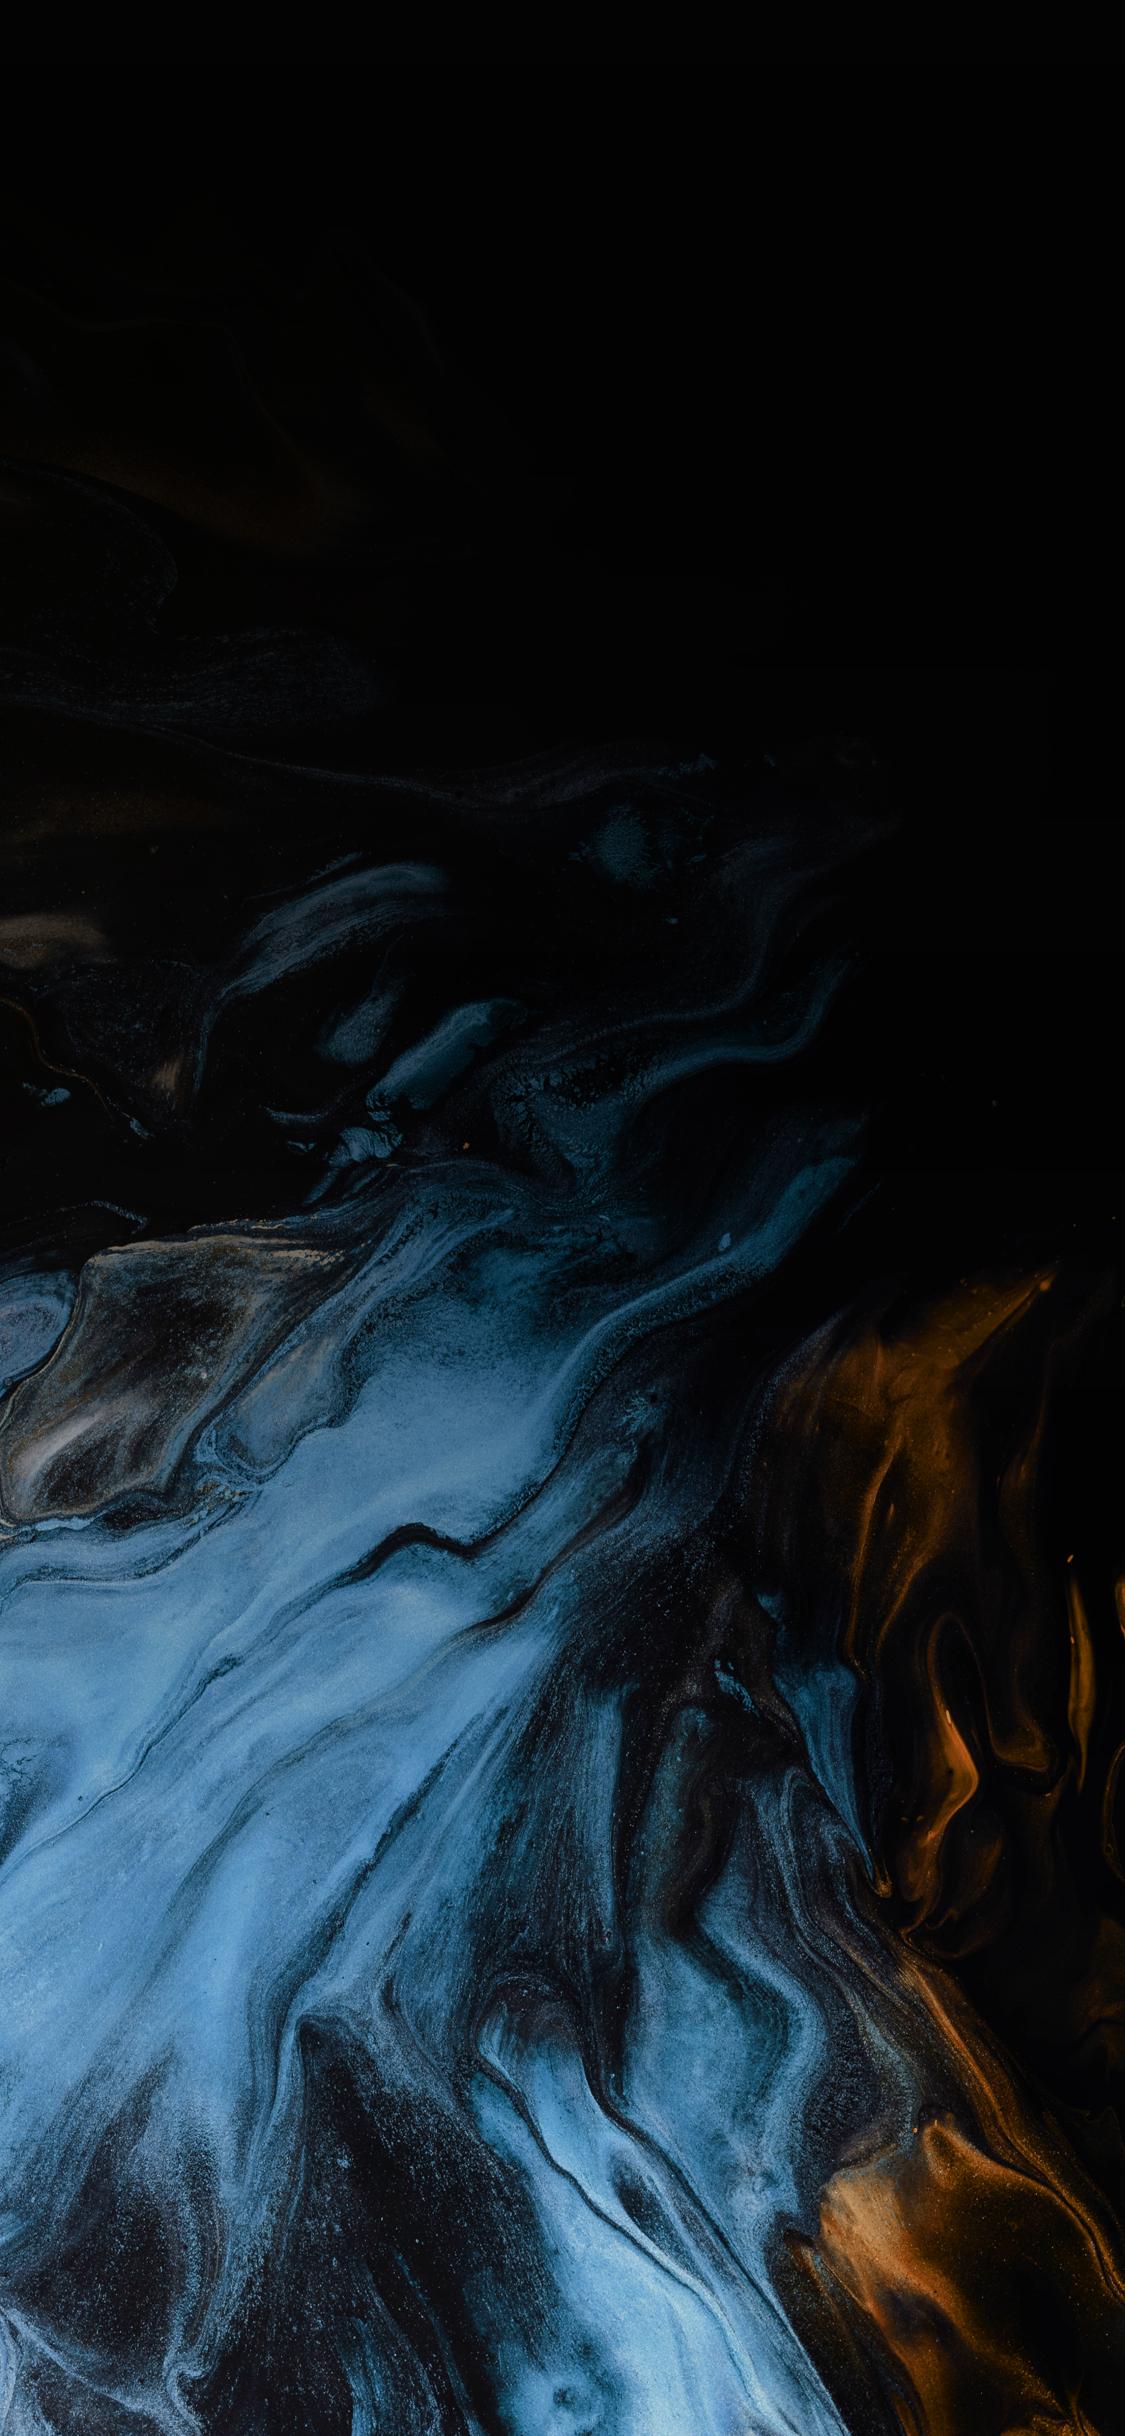 Iphone 11 Pro Max Dark Wallpapers Wallpaper Cave